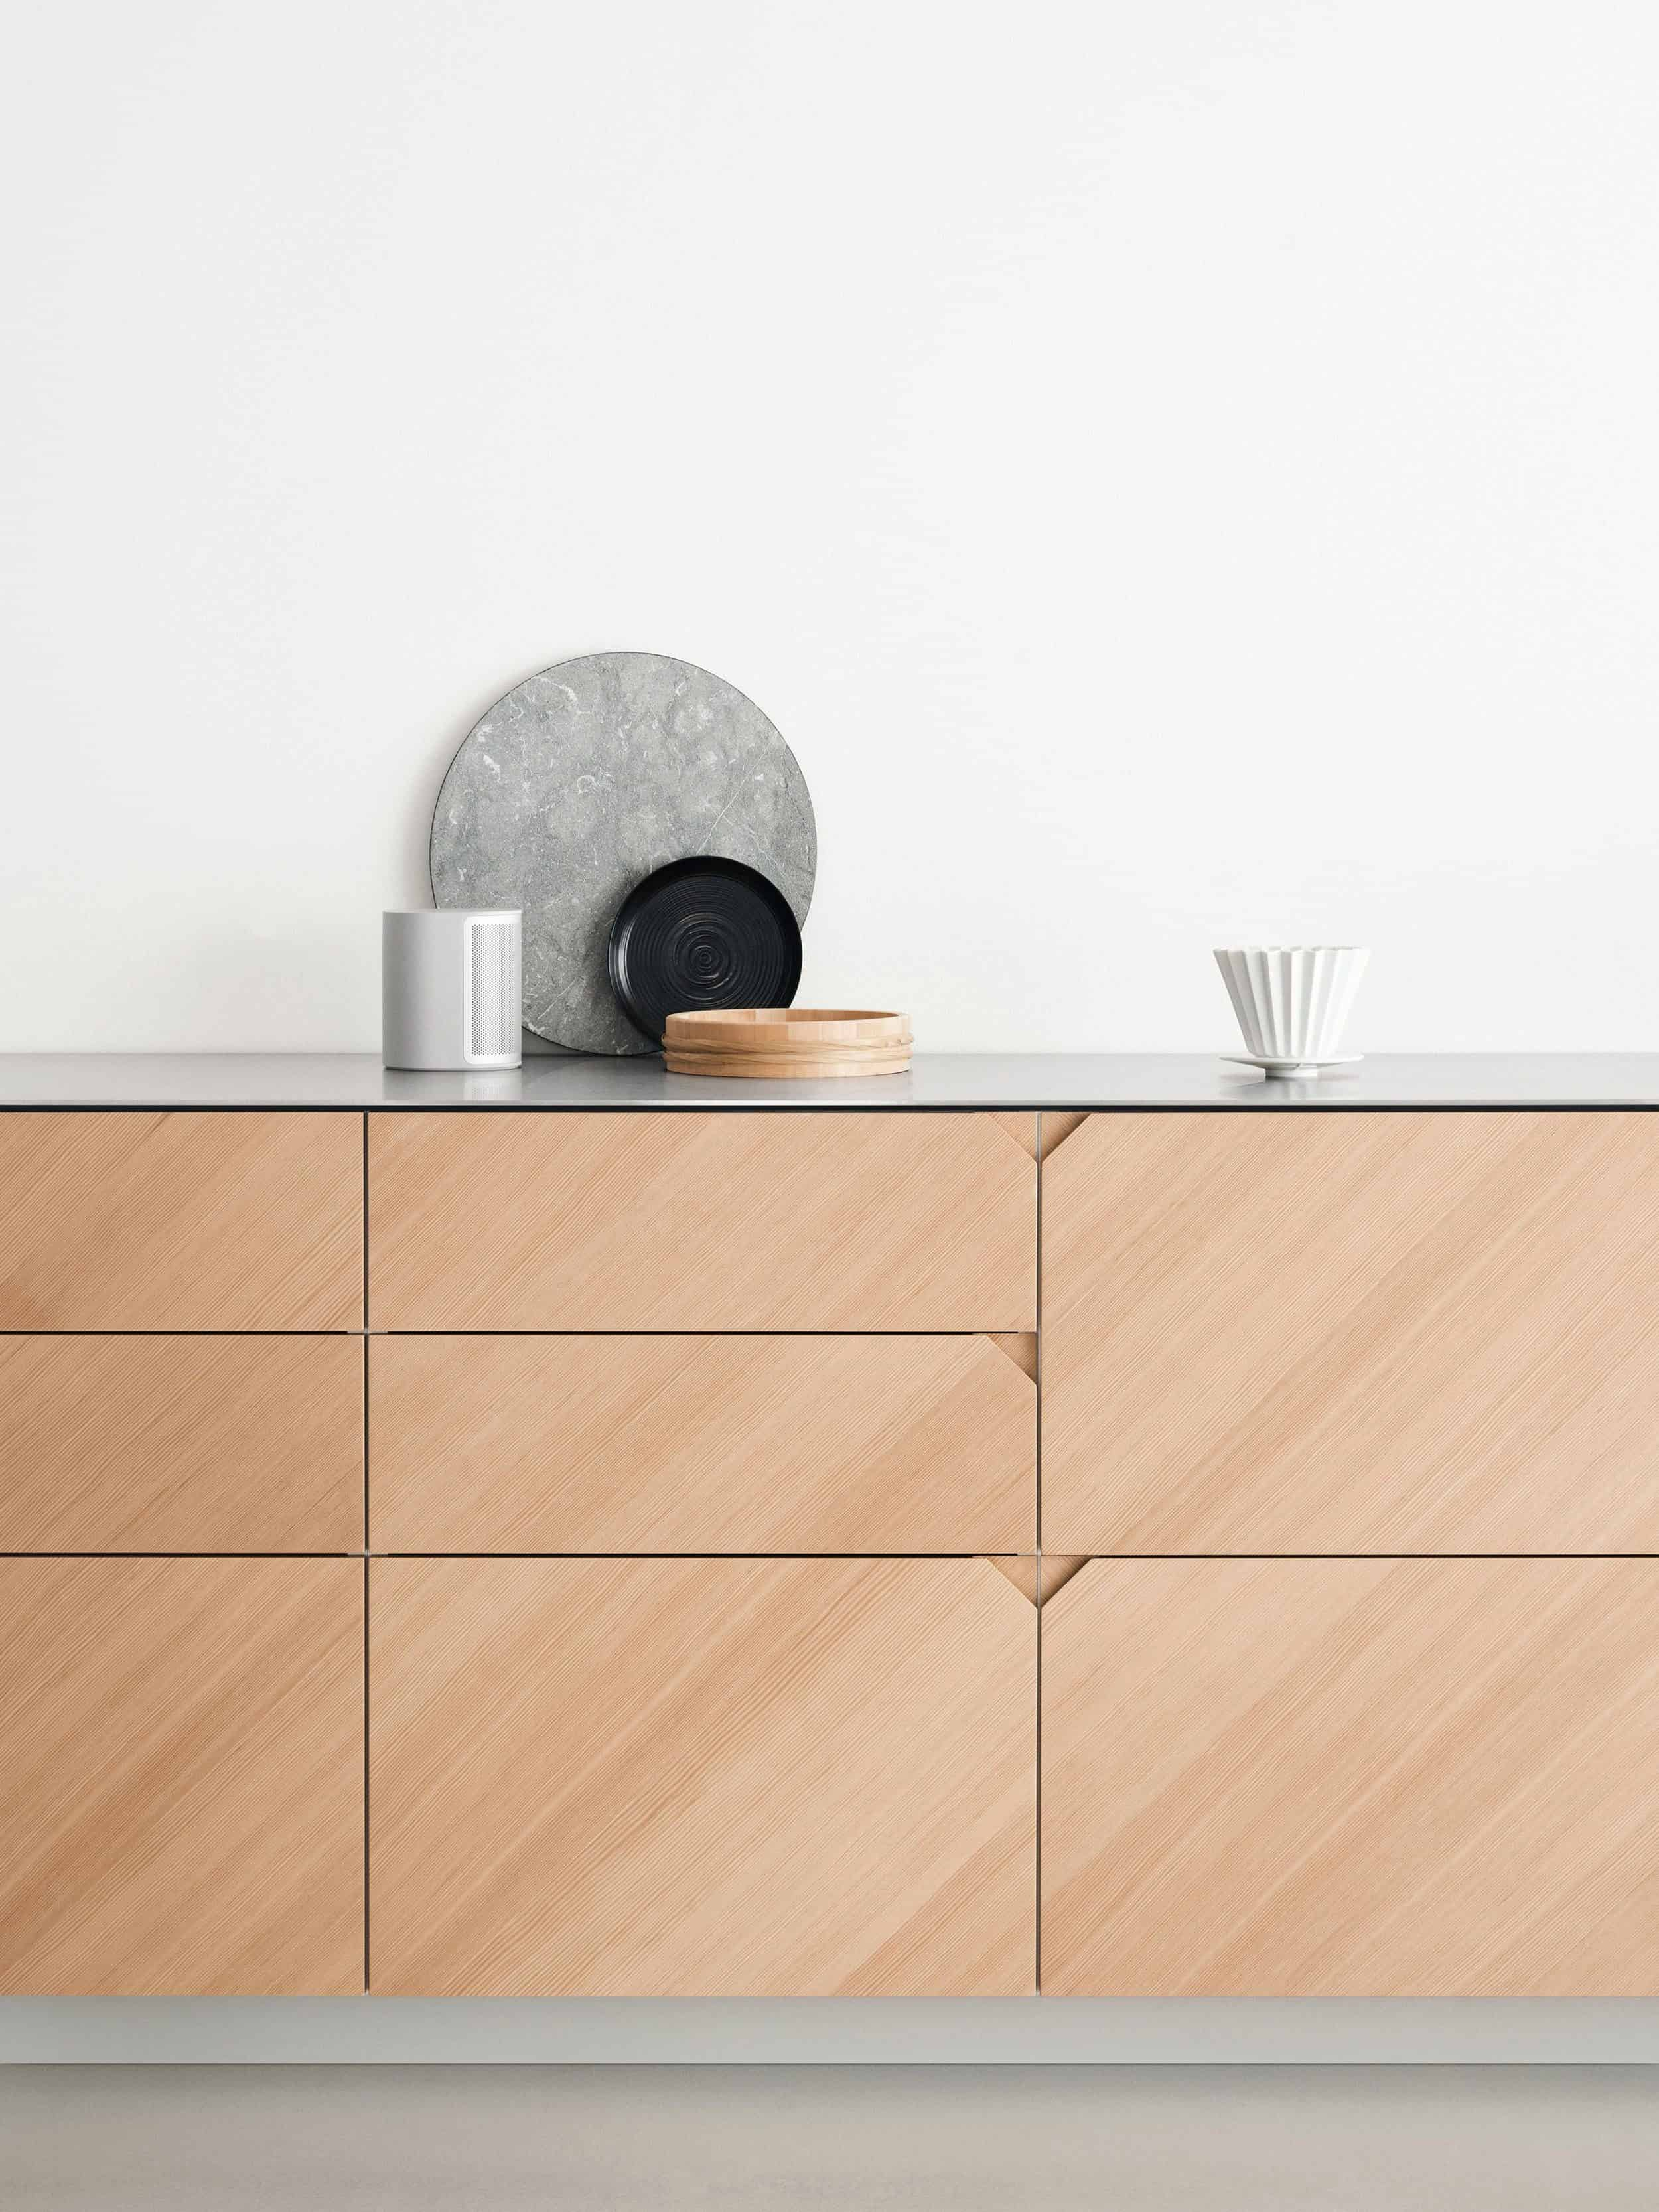 Mijn Keuken Info Cecilie Manz Hacks Ikea Kitchen Using Steel And